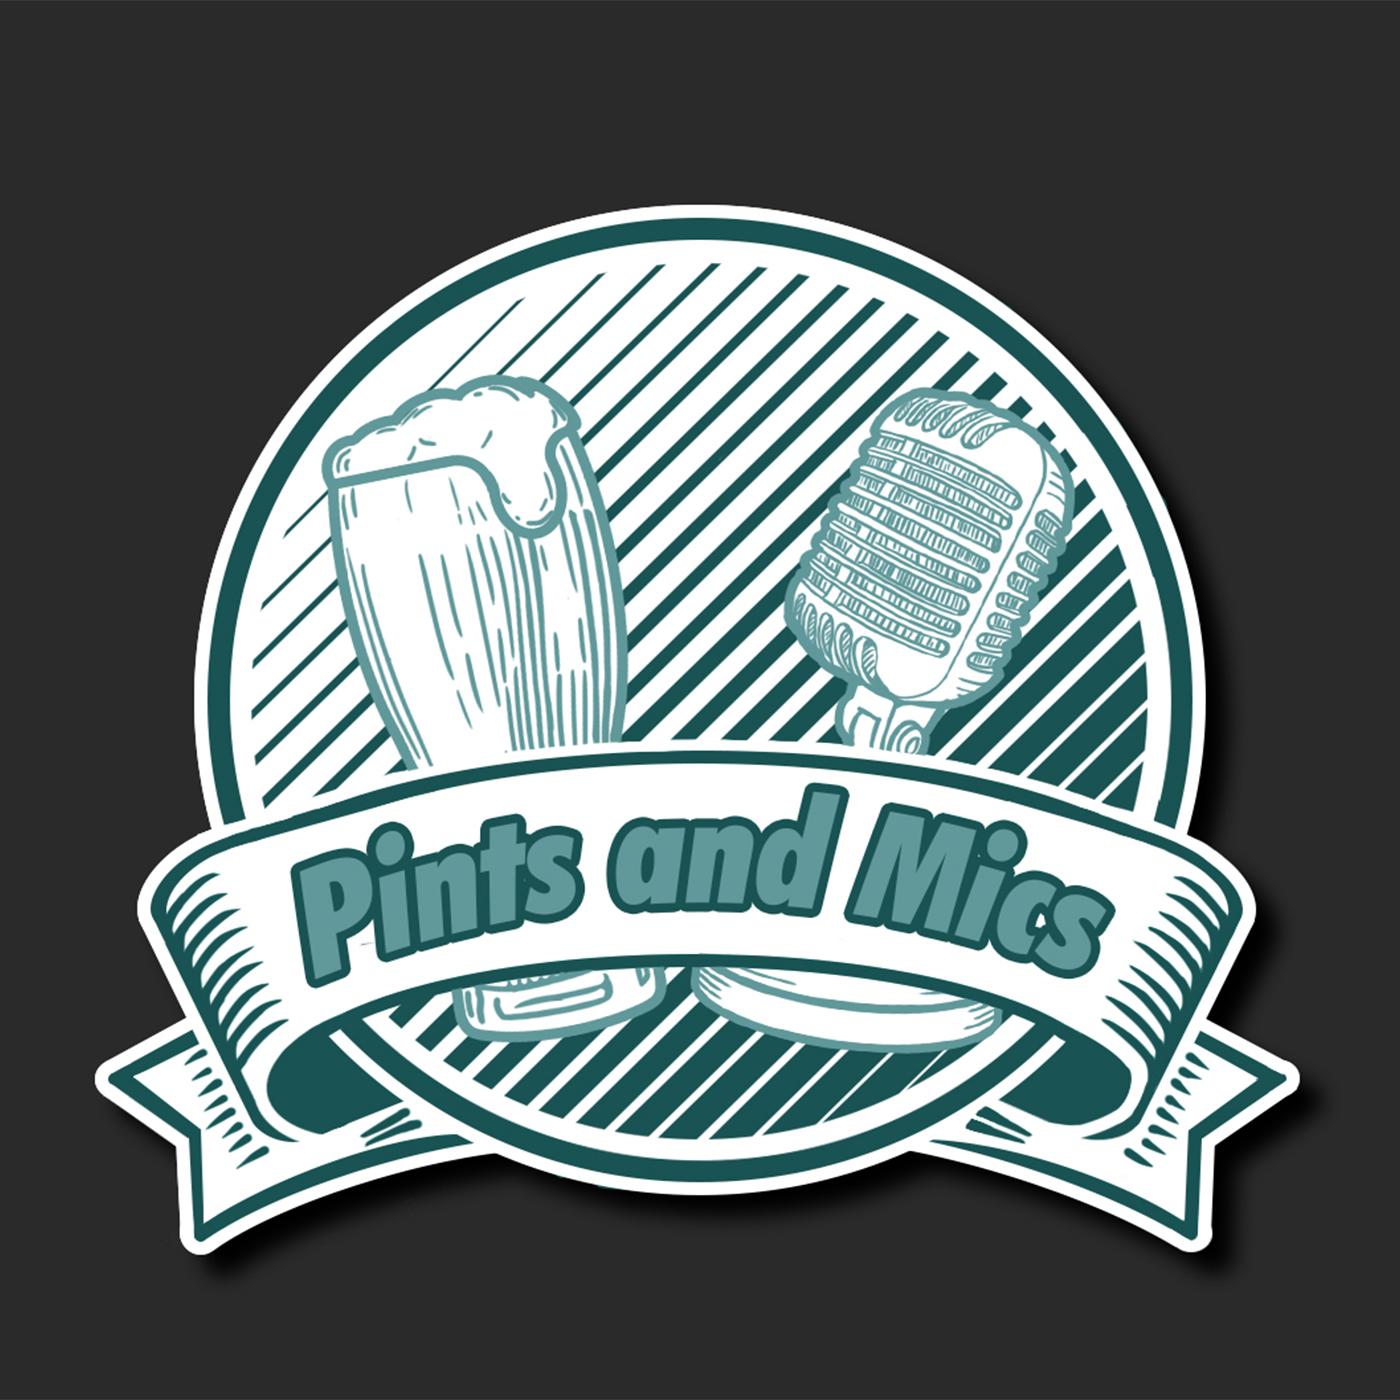 Pints and Mics